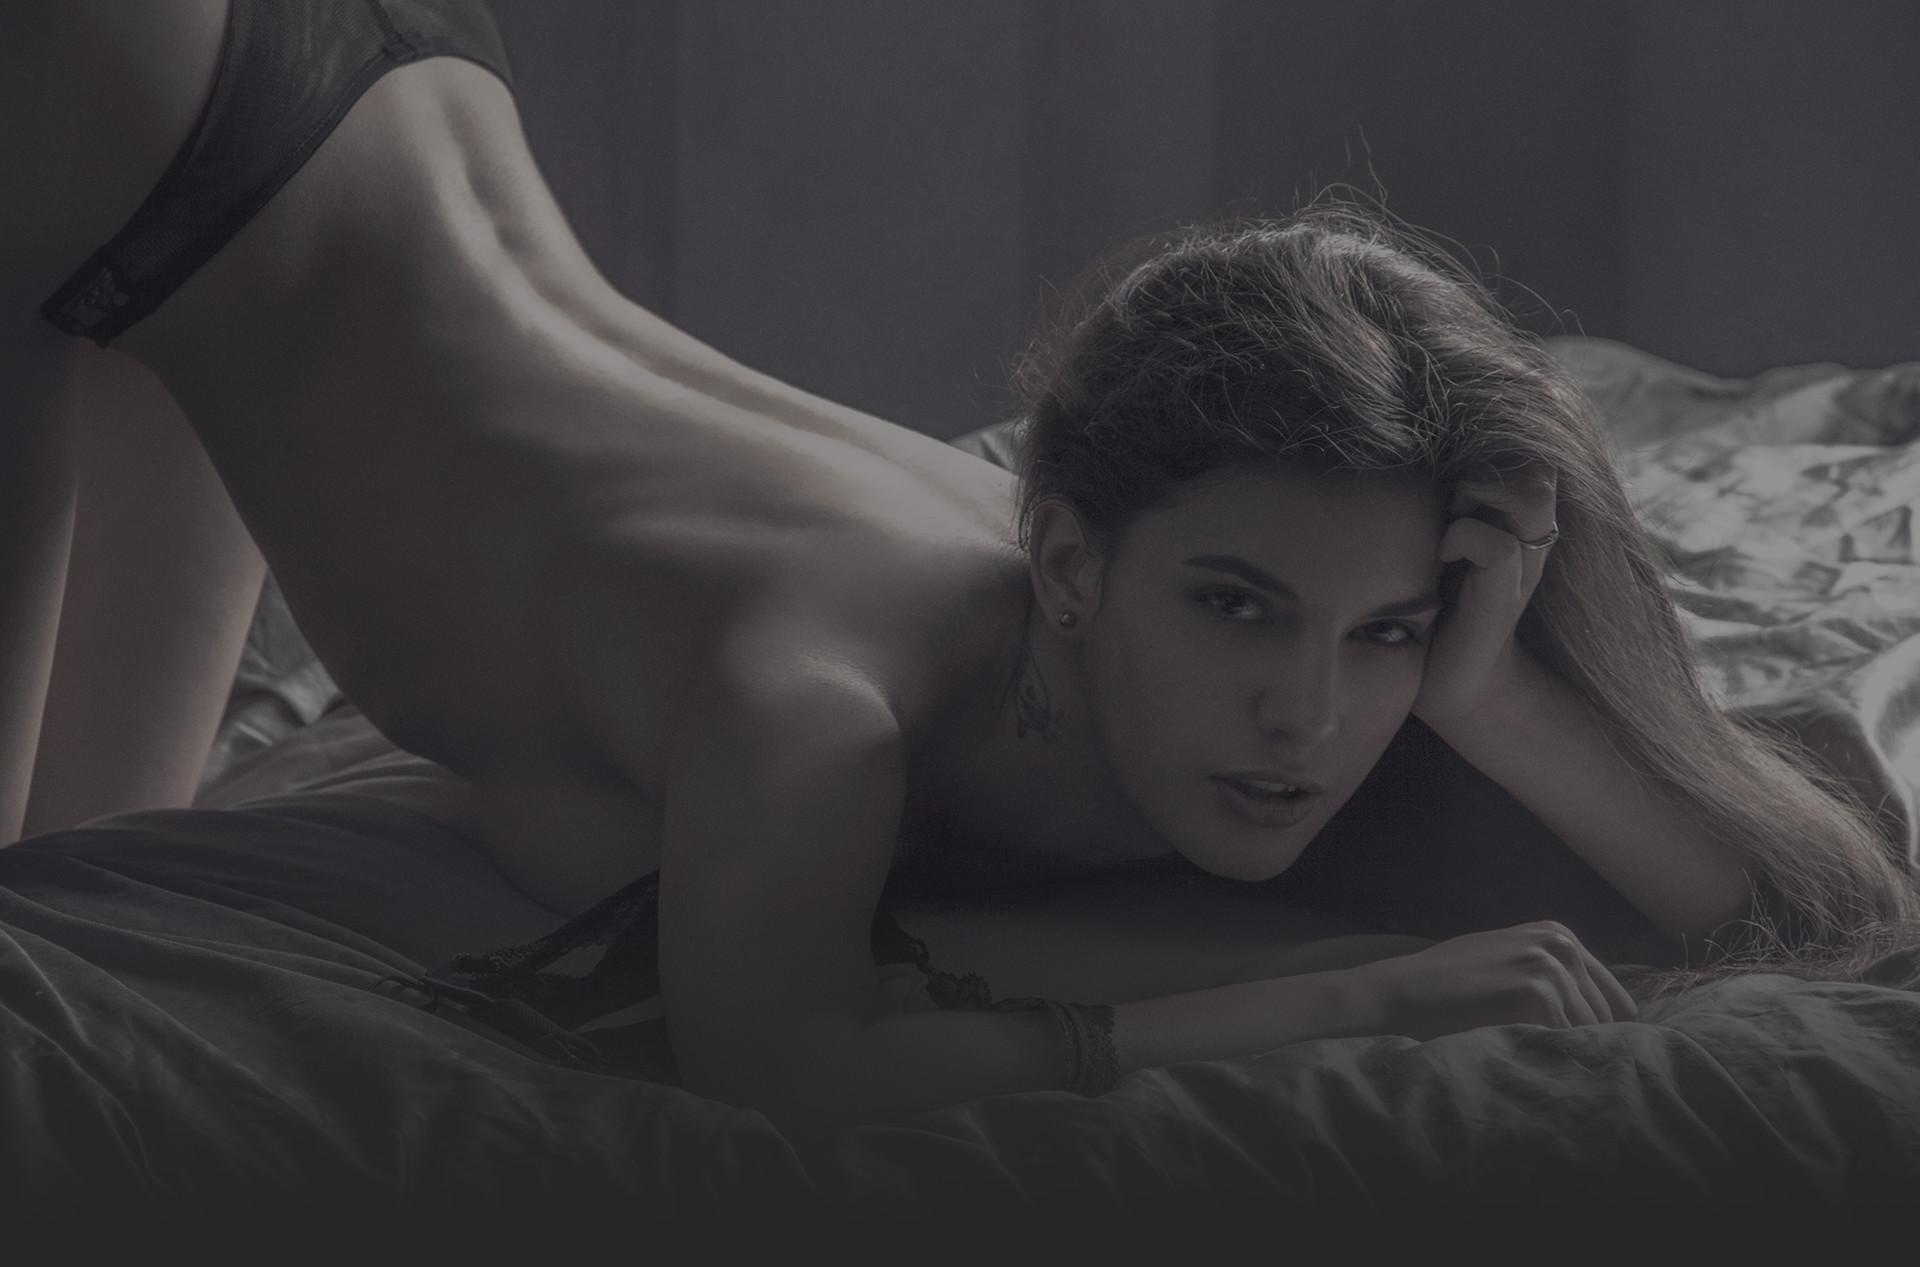 prace v erotice female agent cz